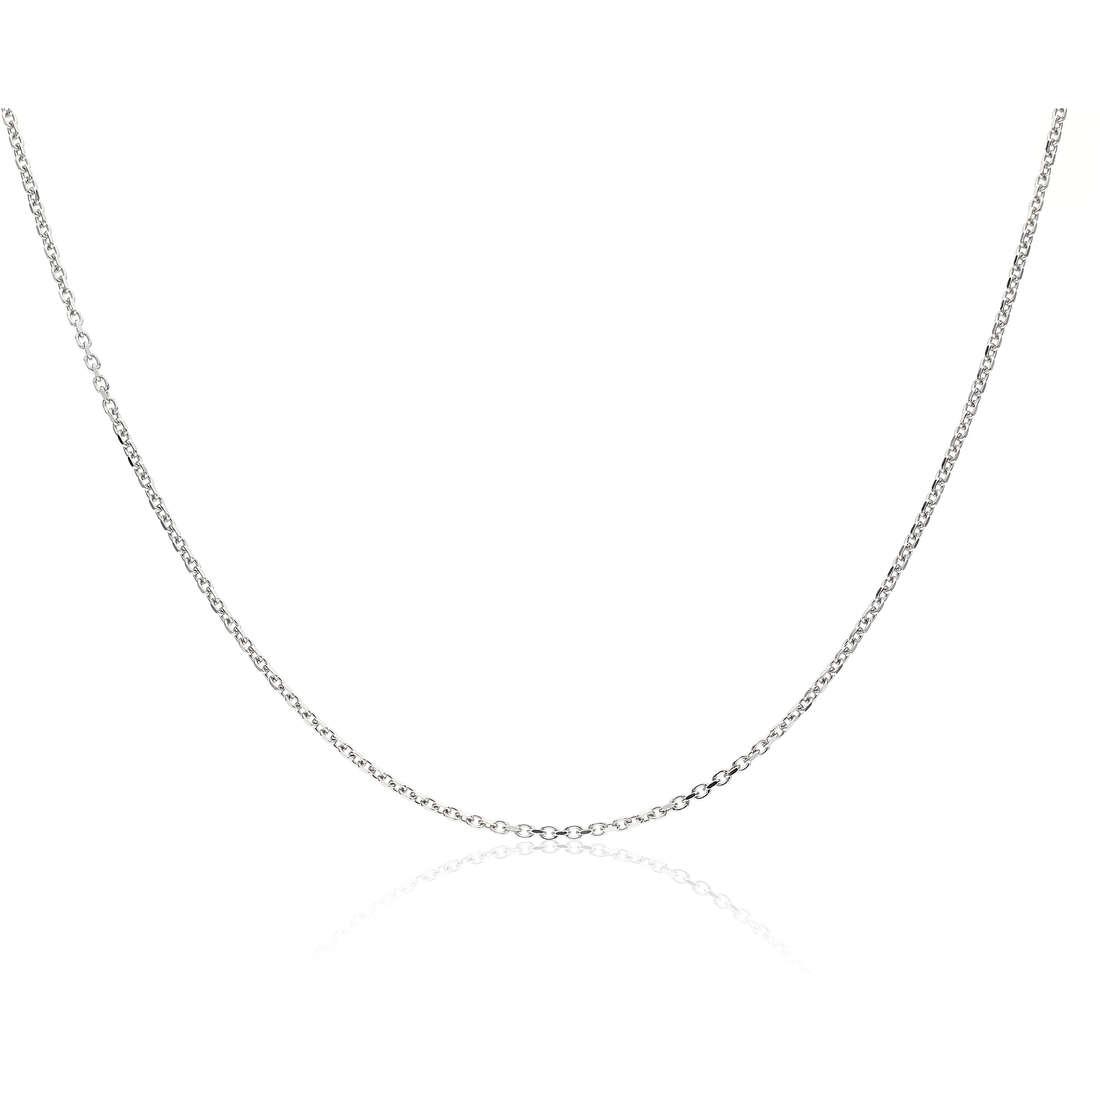 necklace woman jewellery GioiaPura GPSRSCL0758-43